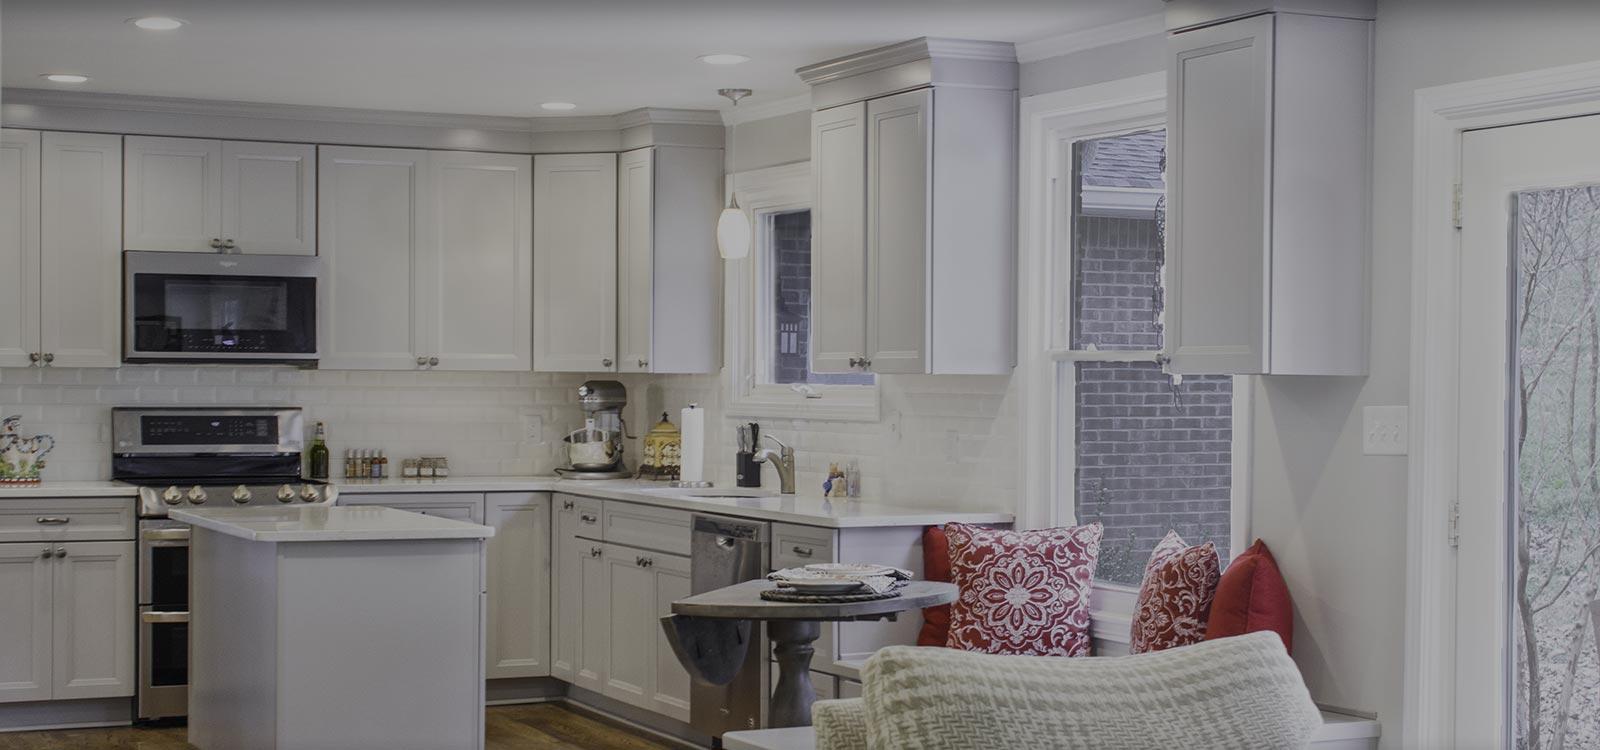 kitchen remodeling company nashville kitchen remodelers renovation contractor